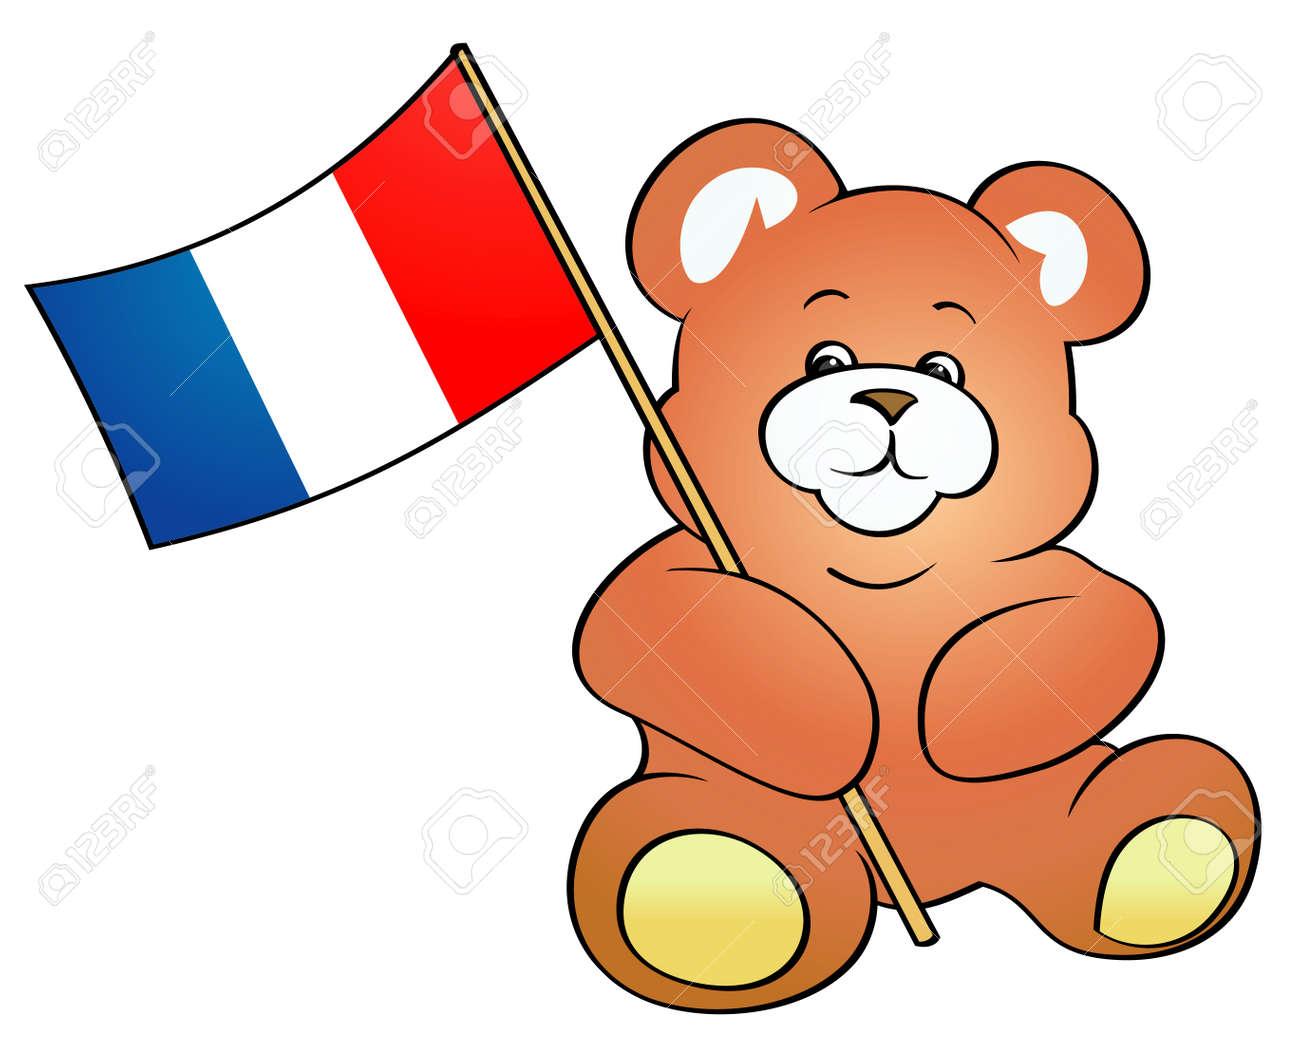 Teddy Bear Holding French Flag - Vector Illustration Stock Vector - 4961640